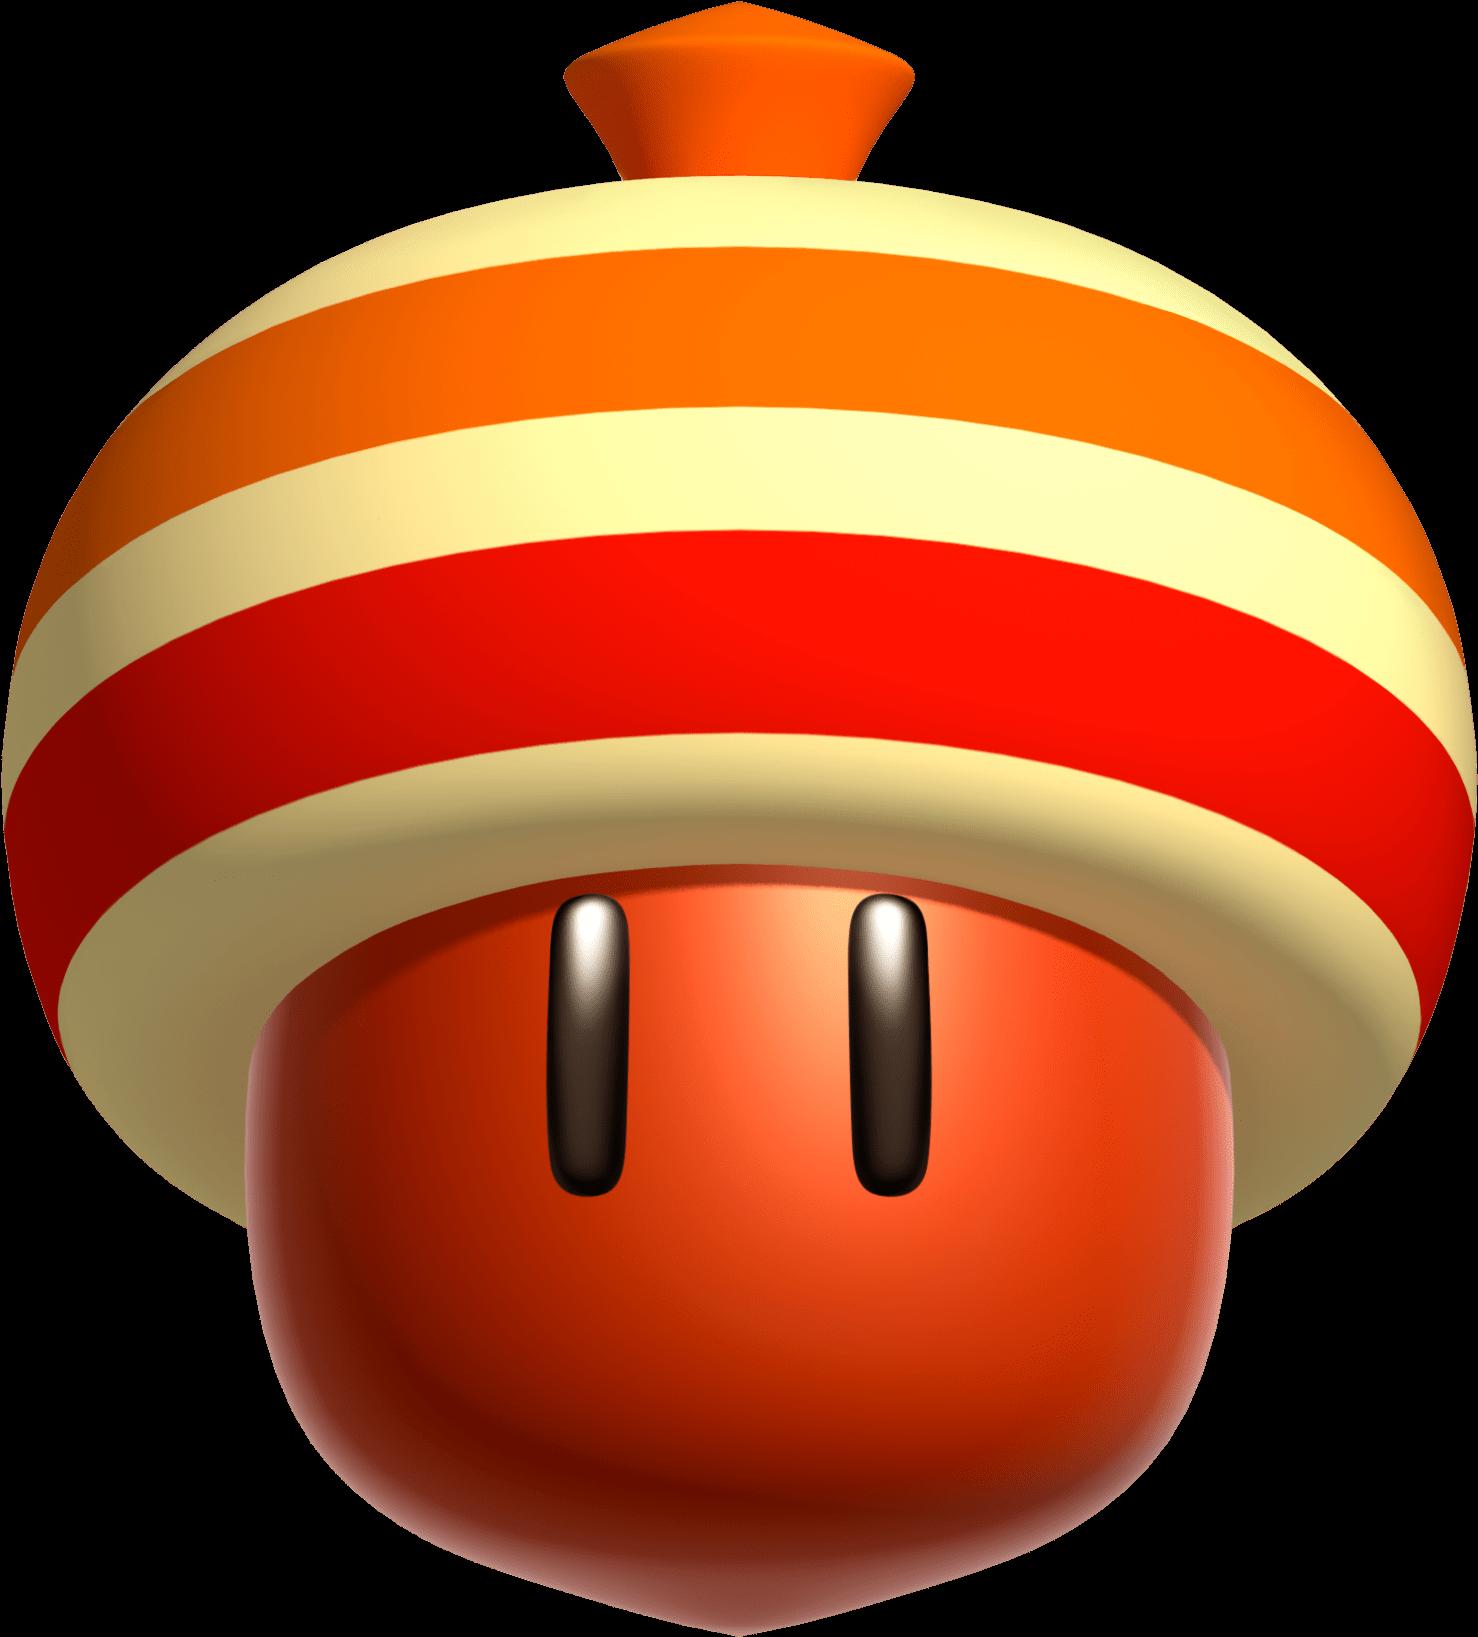 Mario Clipart Supe Power Pencil And In Color Mario.